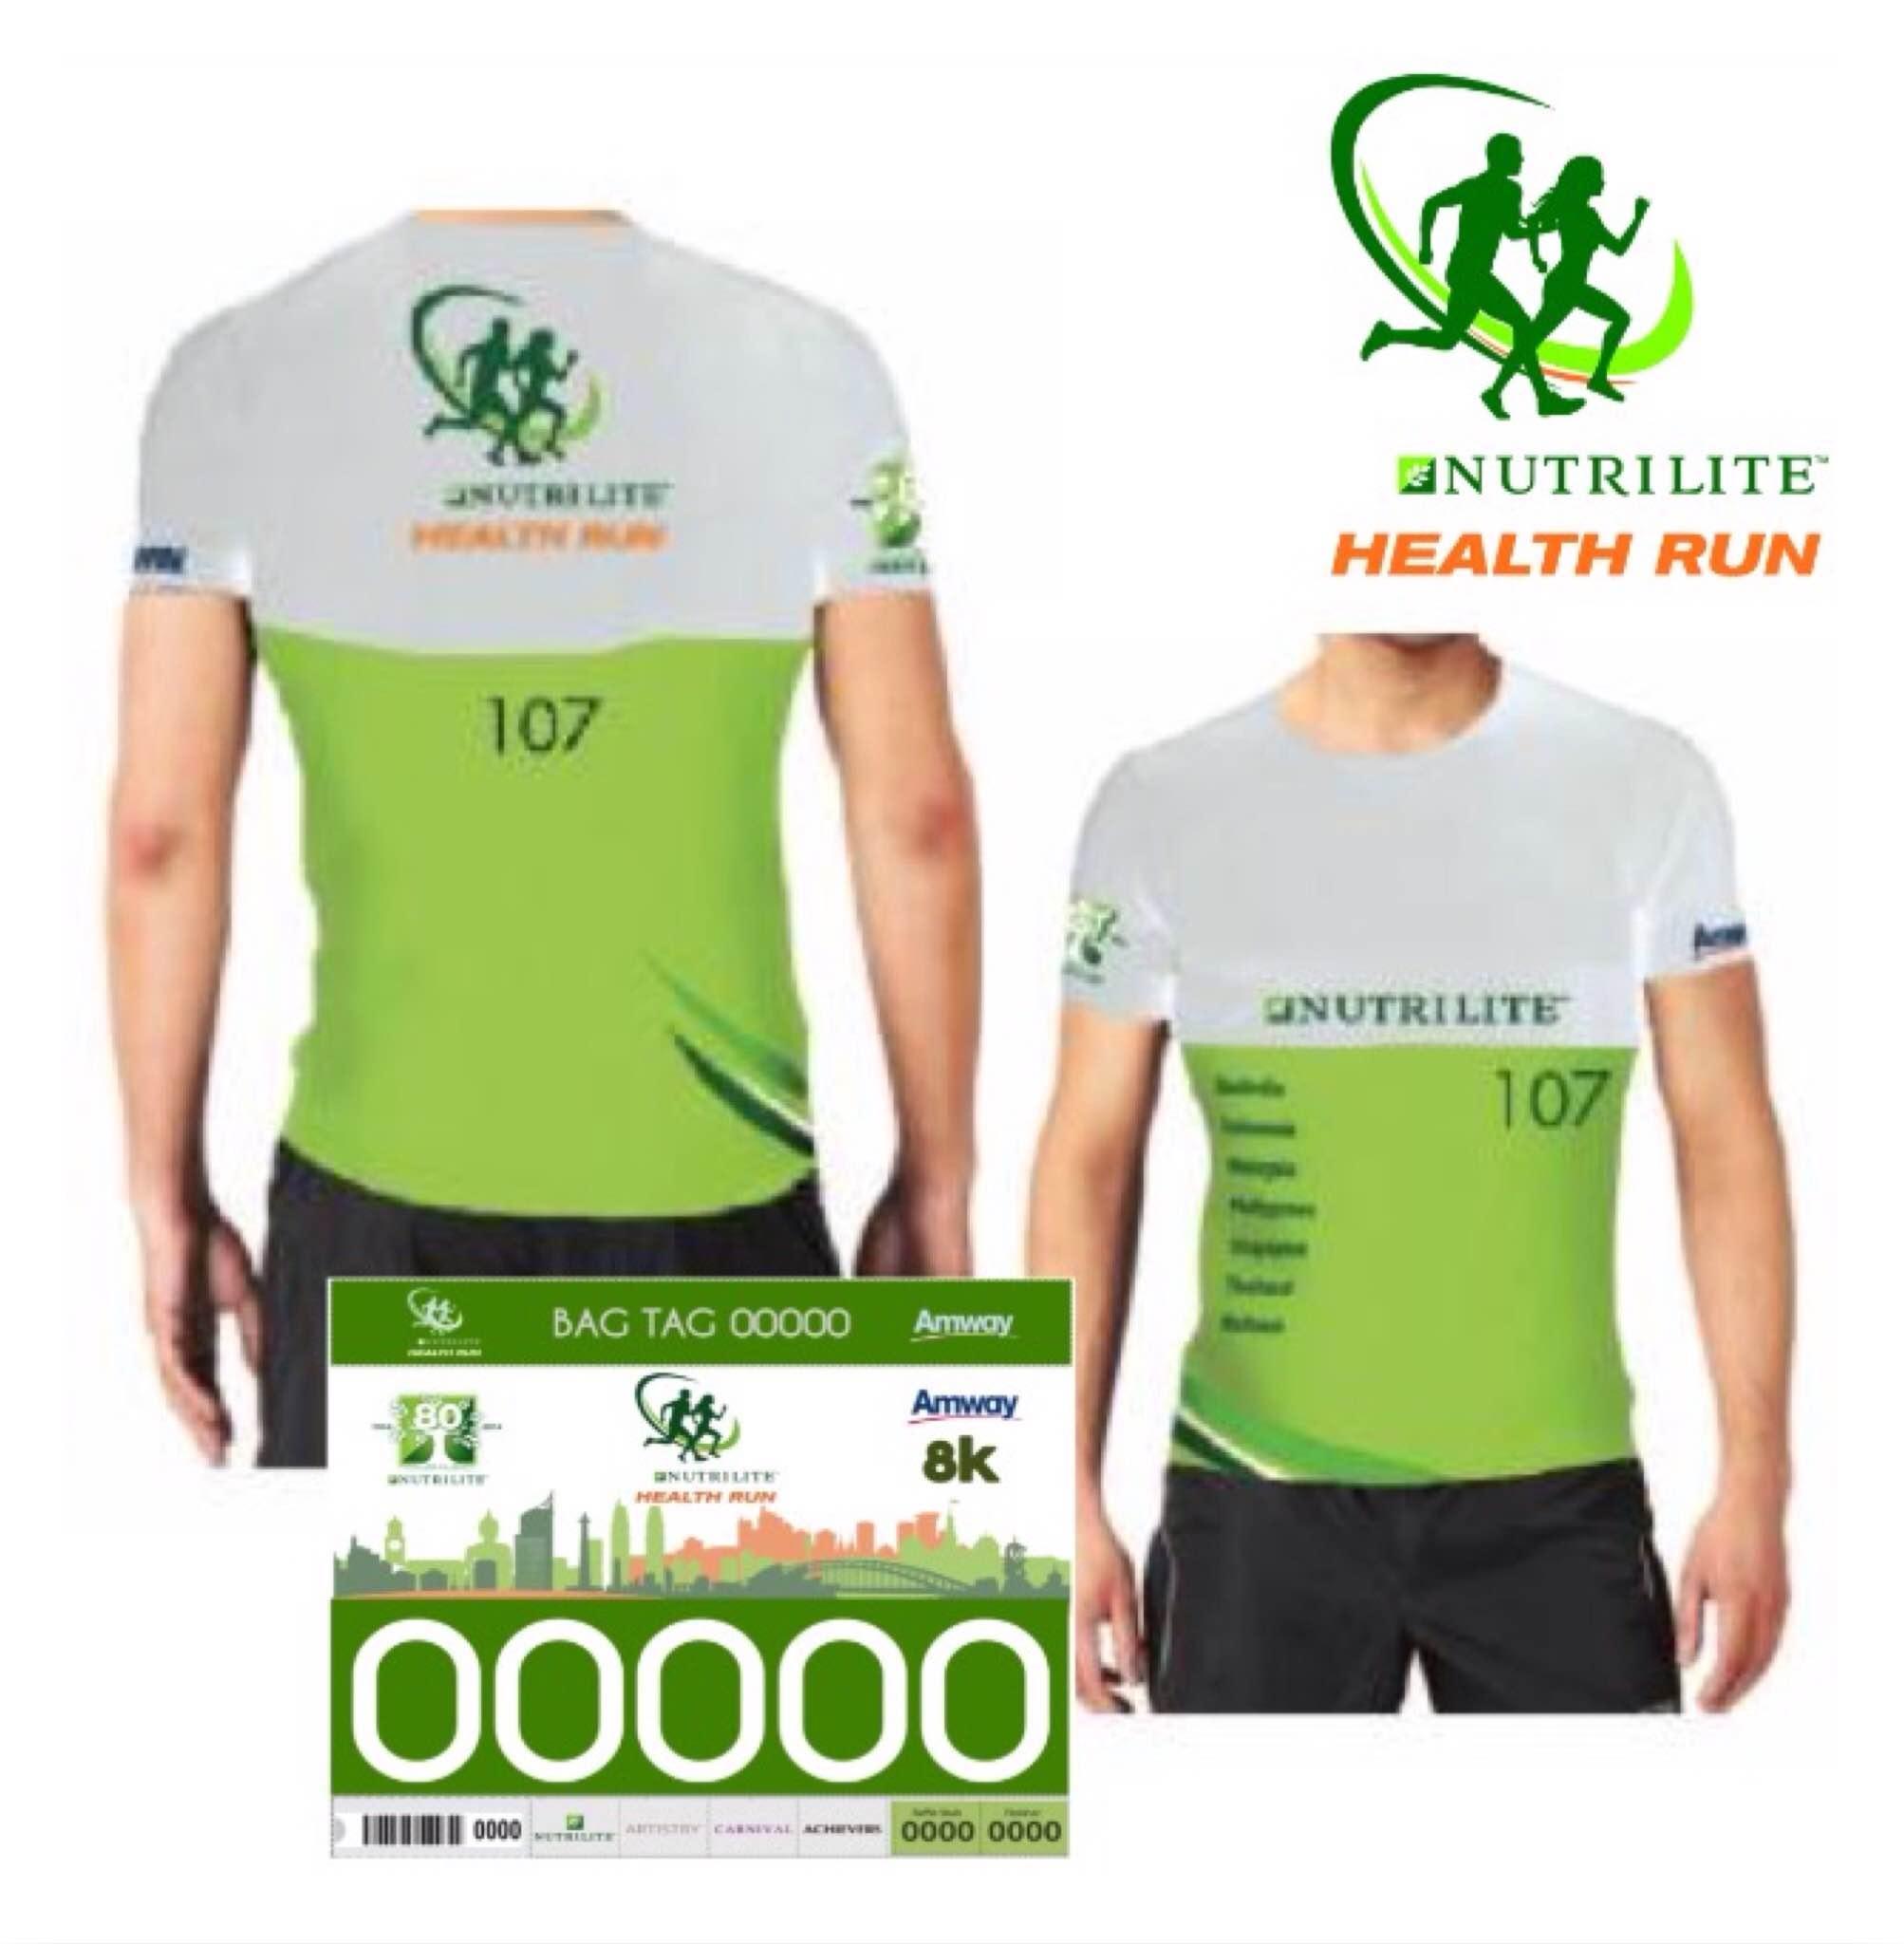 Amway Nutrilite Health Run 2015 in CDO 4